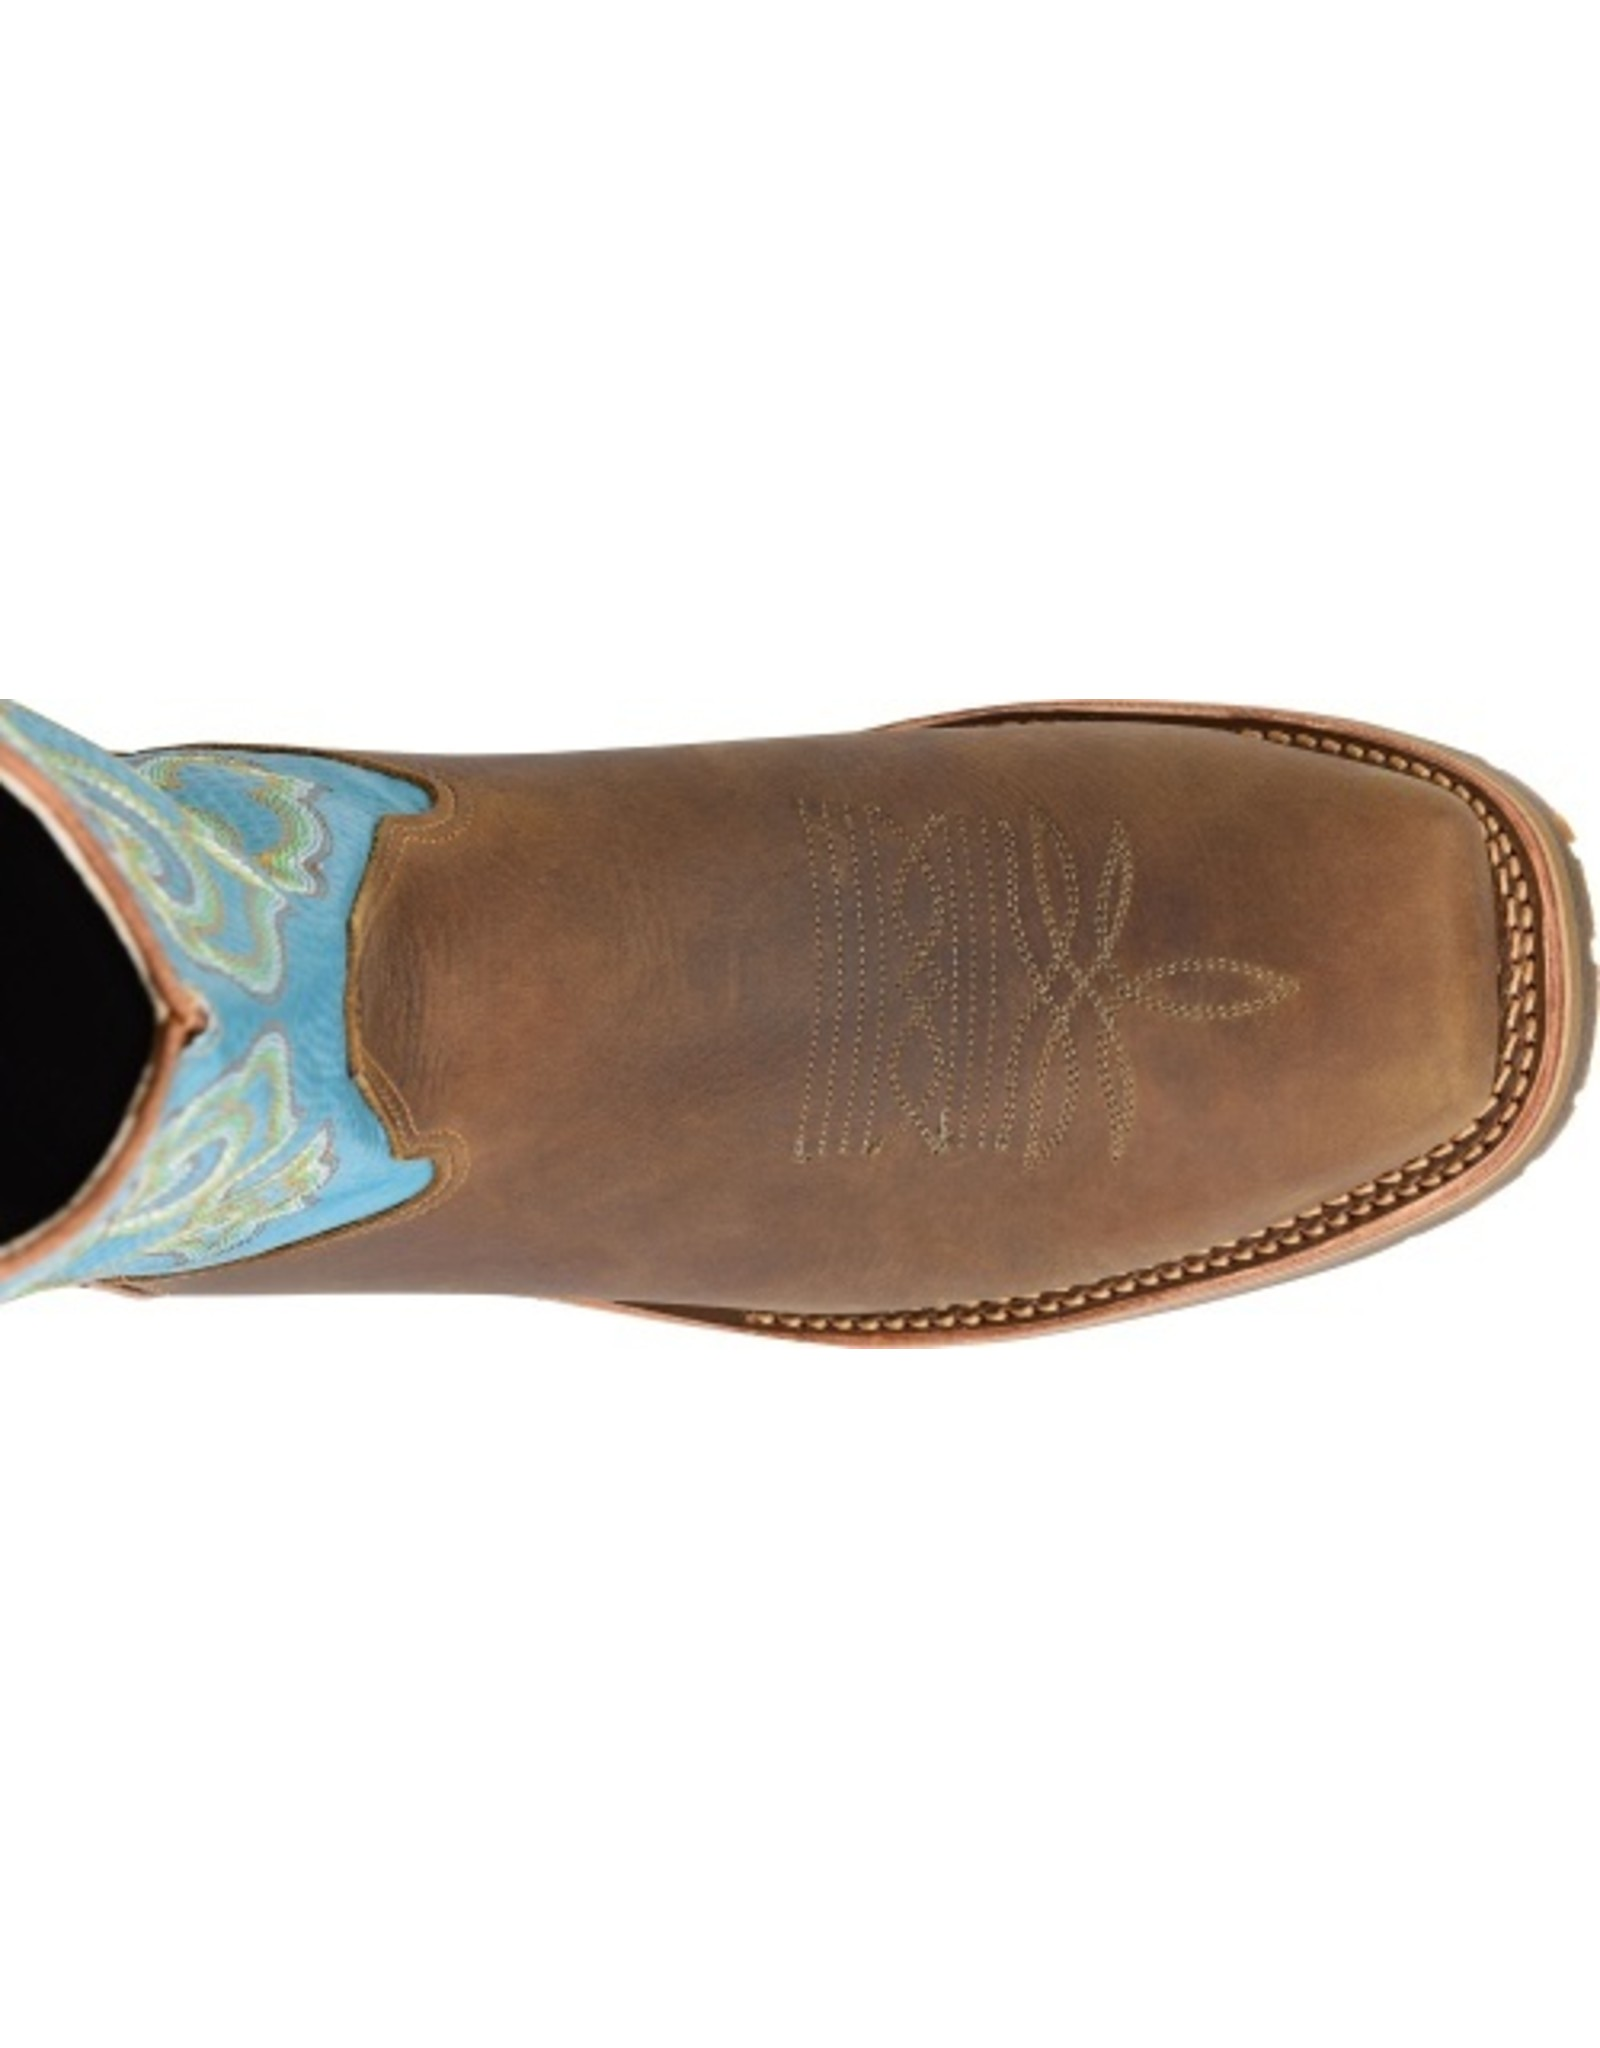 Boots-Men Double H DH3576 Eric Tan Steel Toe